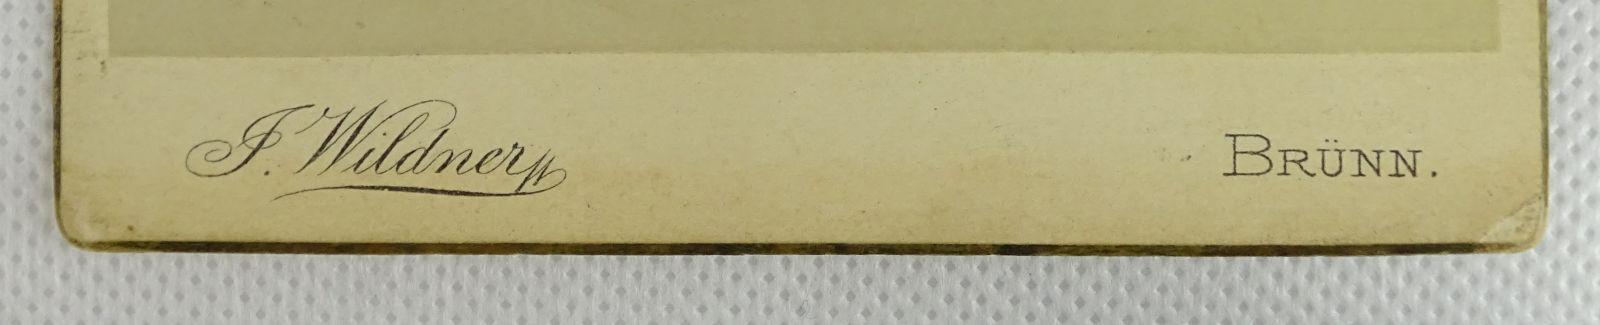 DSC04894.JPG (1600×325)